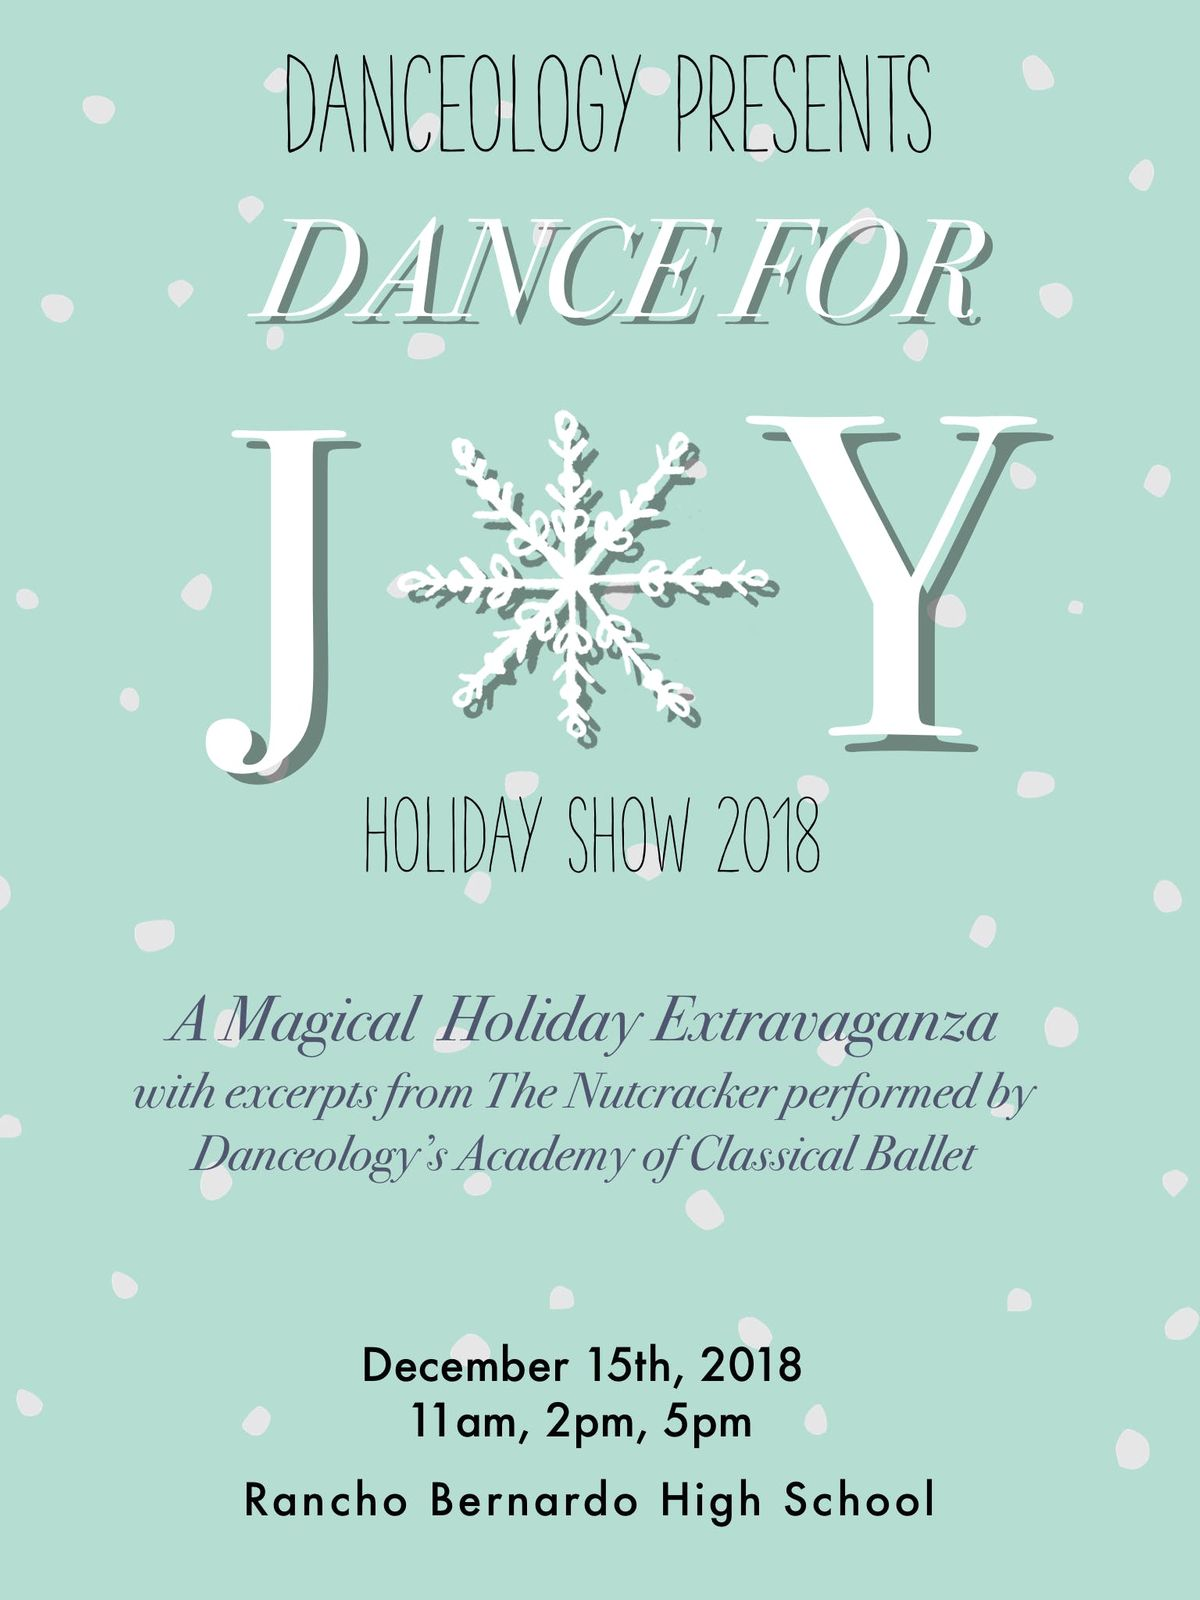 Rancho Bernardo High School Campus Map.Danceologys Annual Holiday Show Dance For Joy At Rancho Bernardo